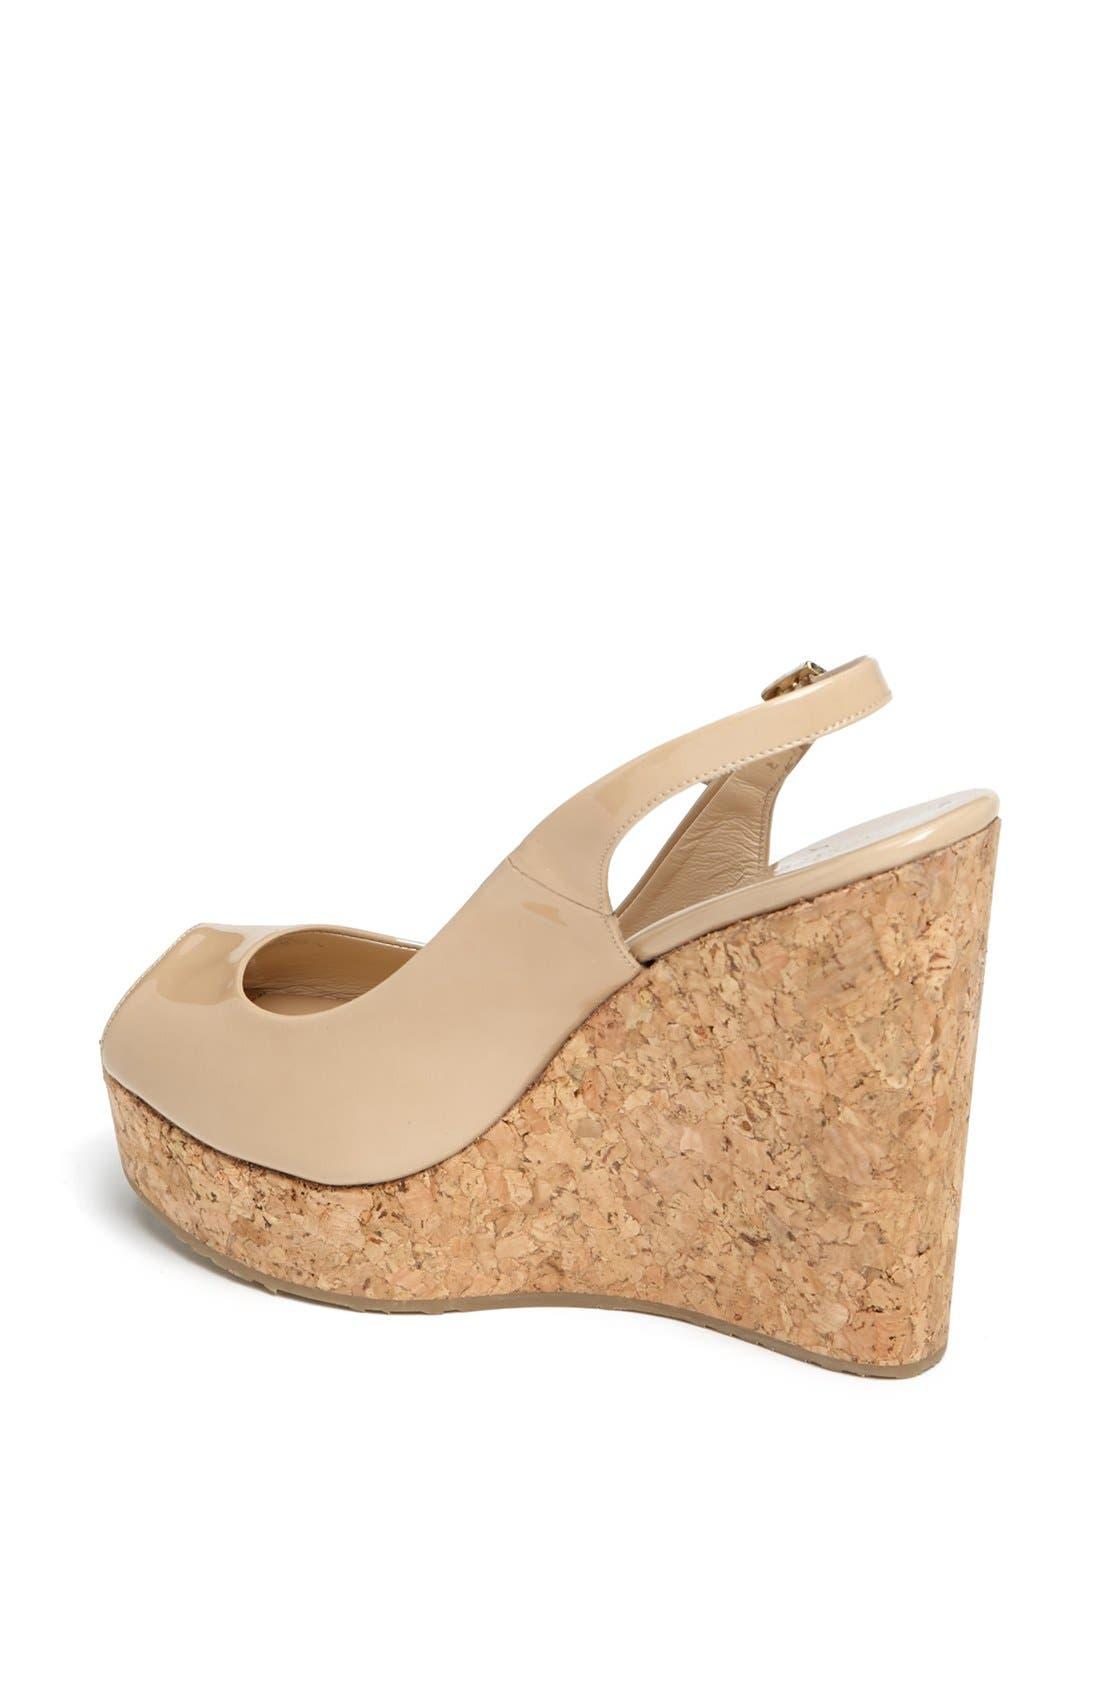 'Prova' Cork Slingback Wedge Sandal,                             Alternate thumbnail 6, color,                             270